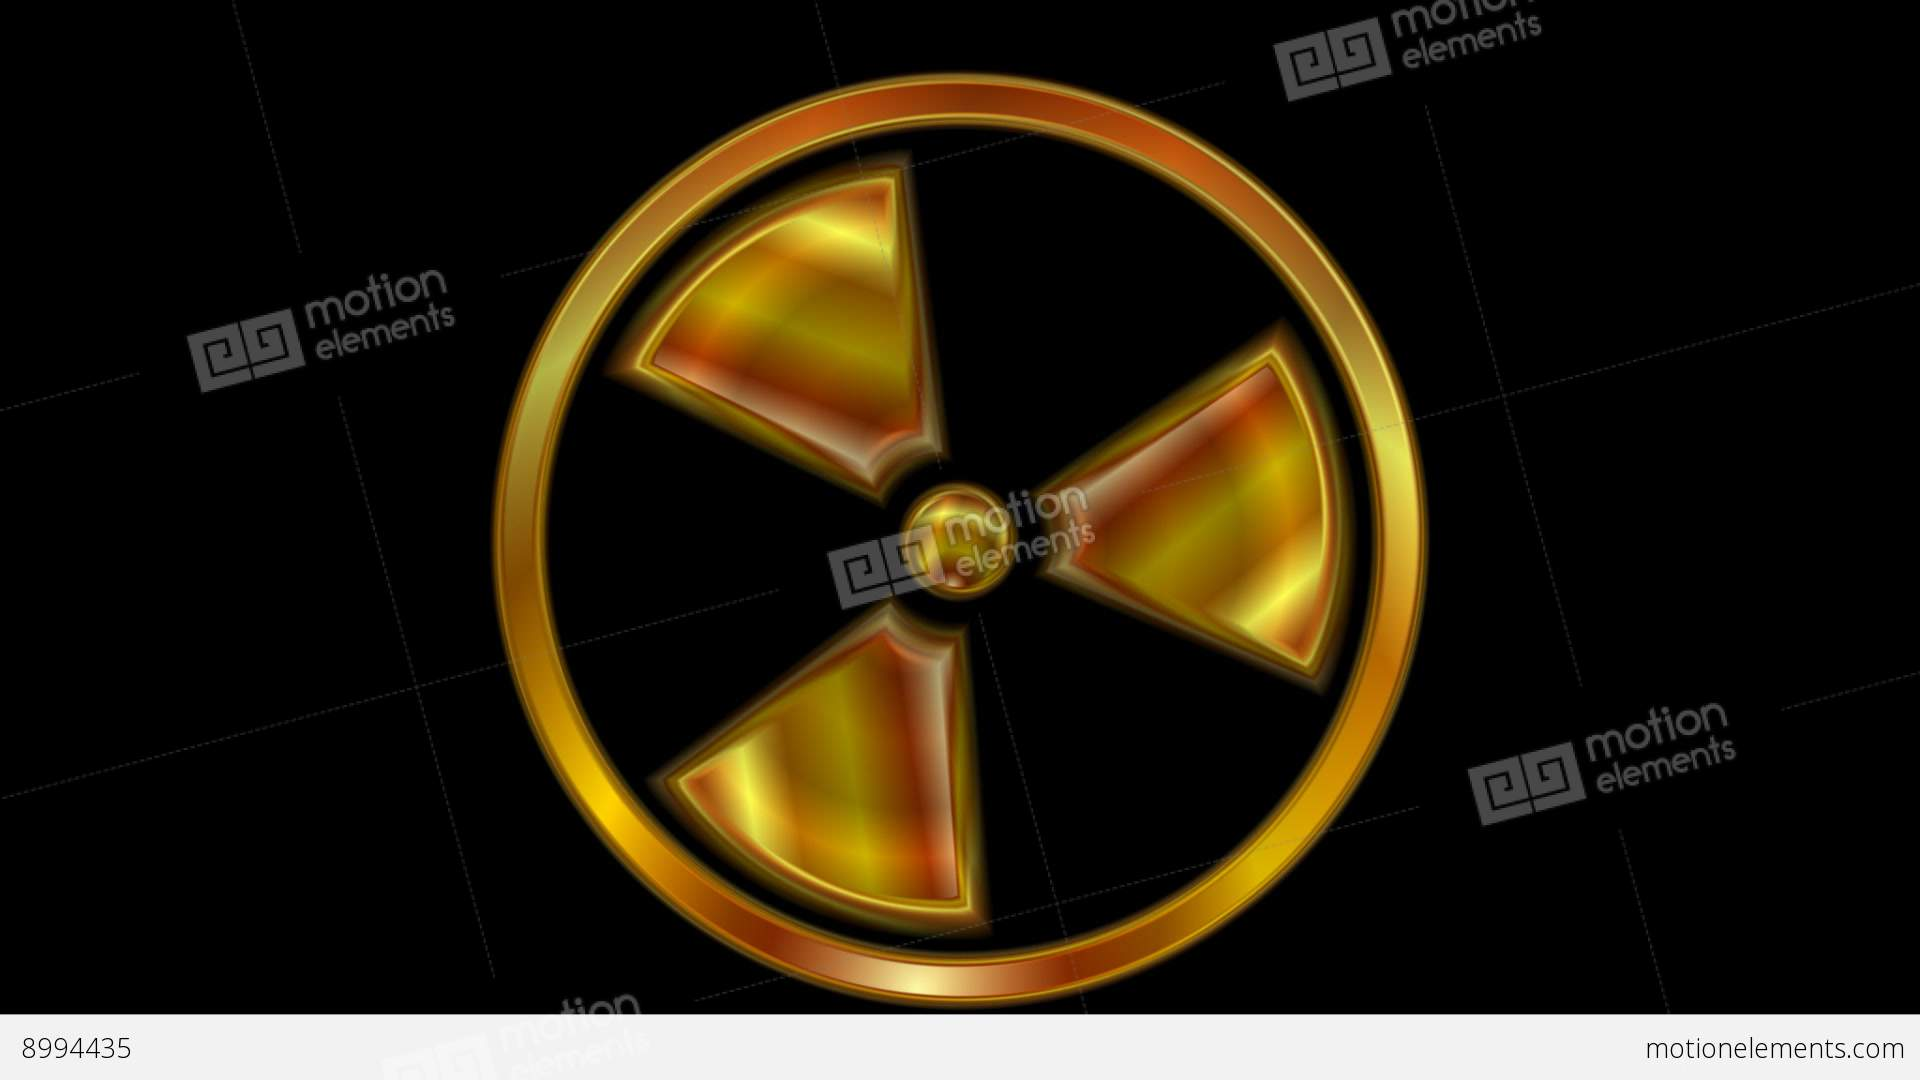 Radioactive symbol video animation seamless loop stock animation radioactive symbol video animation seamless loop stock video footage buycottarizona